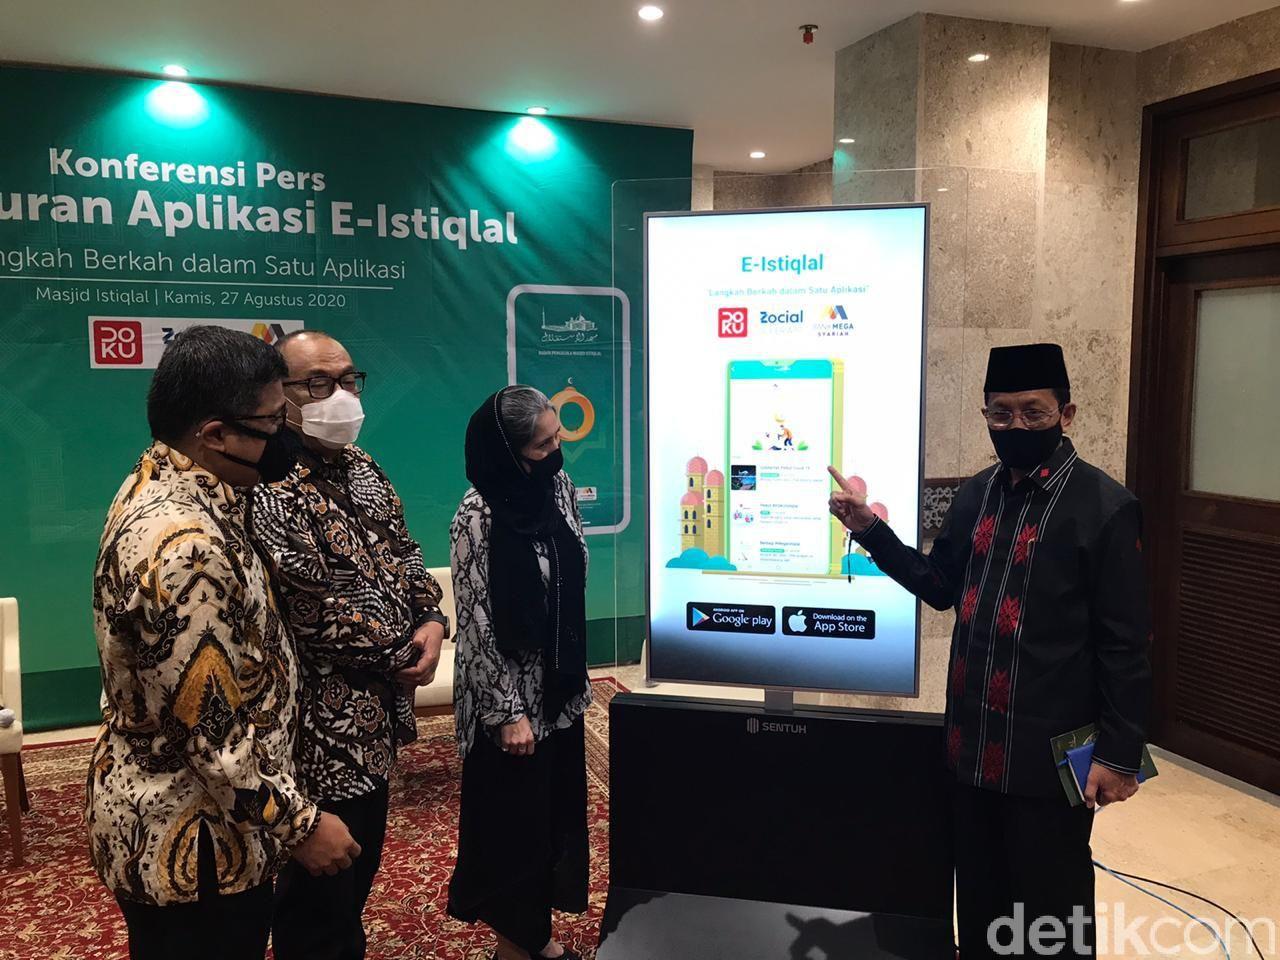 Suasana peluncuran aplikasi E-Istiqlal